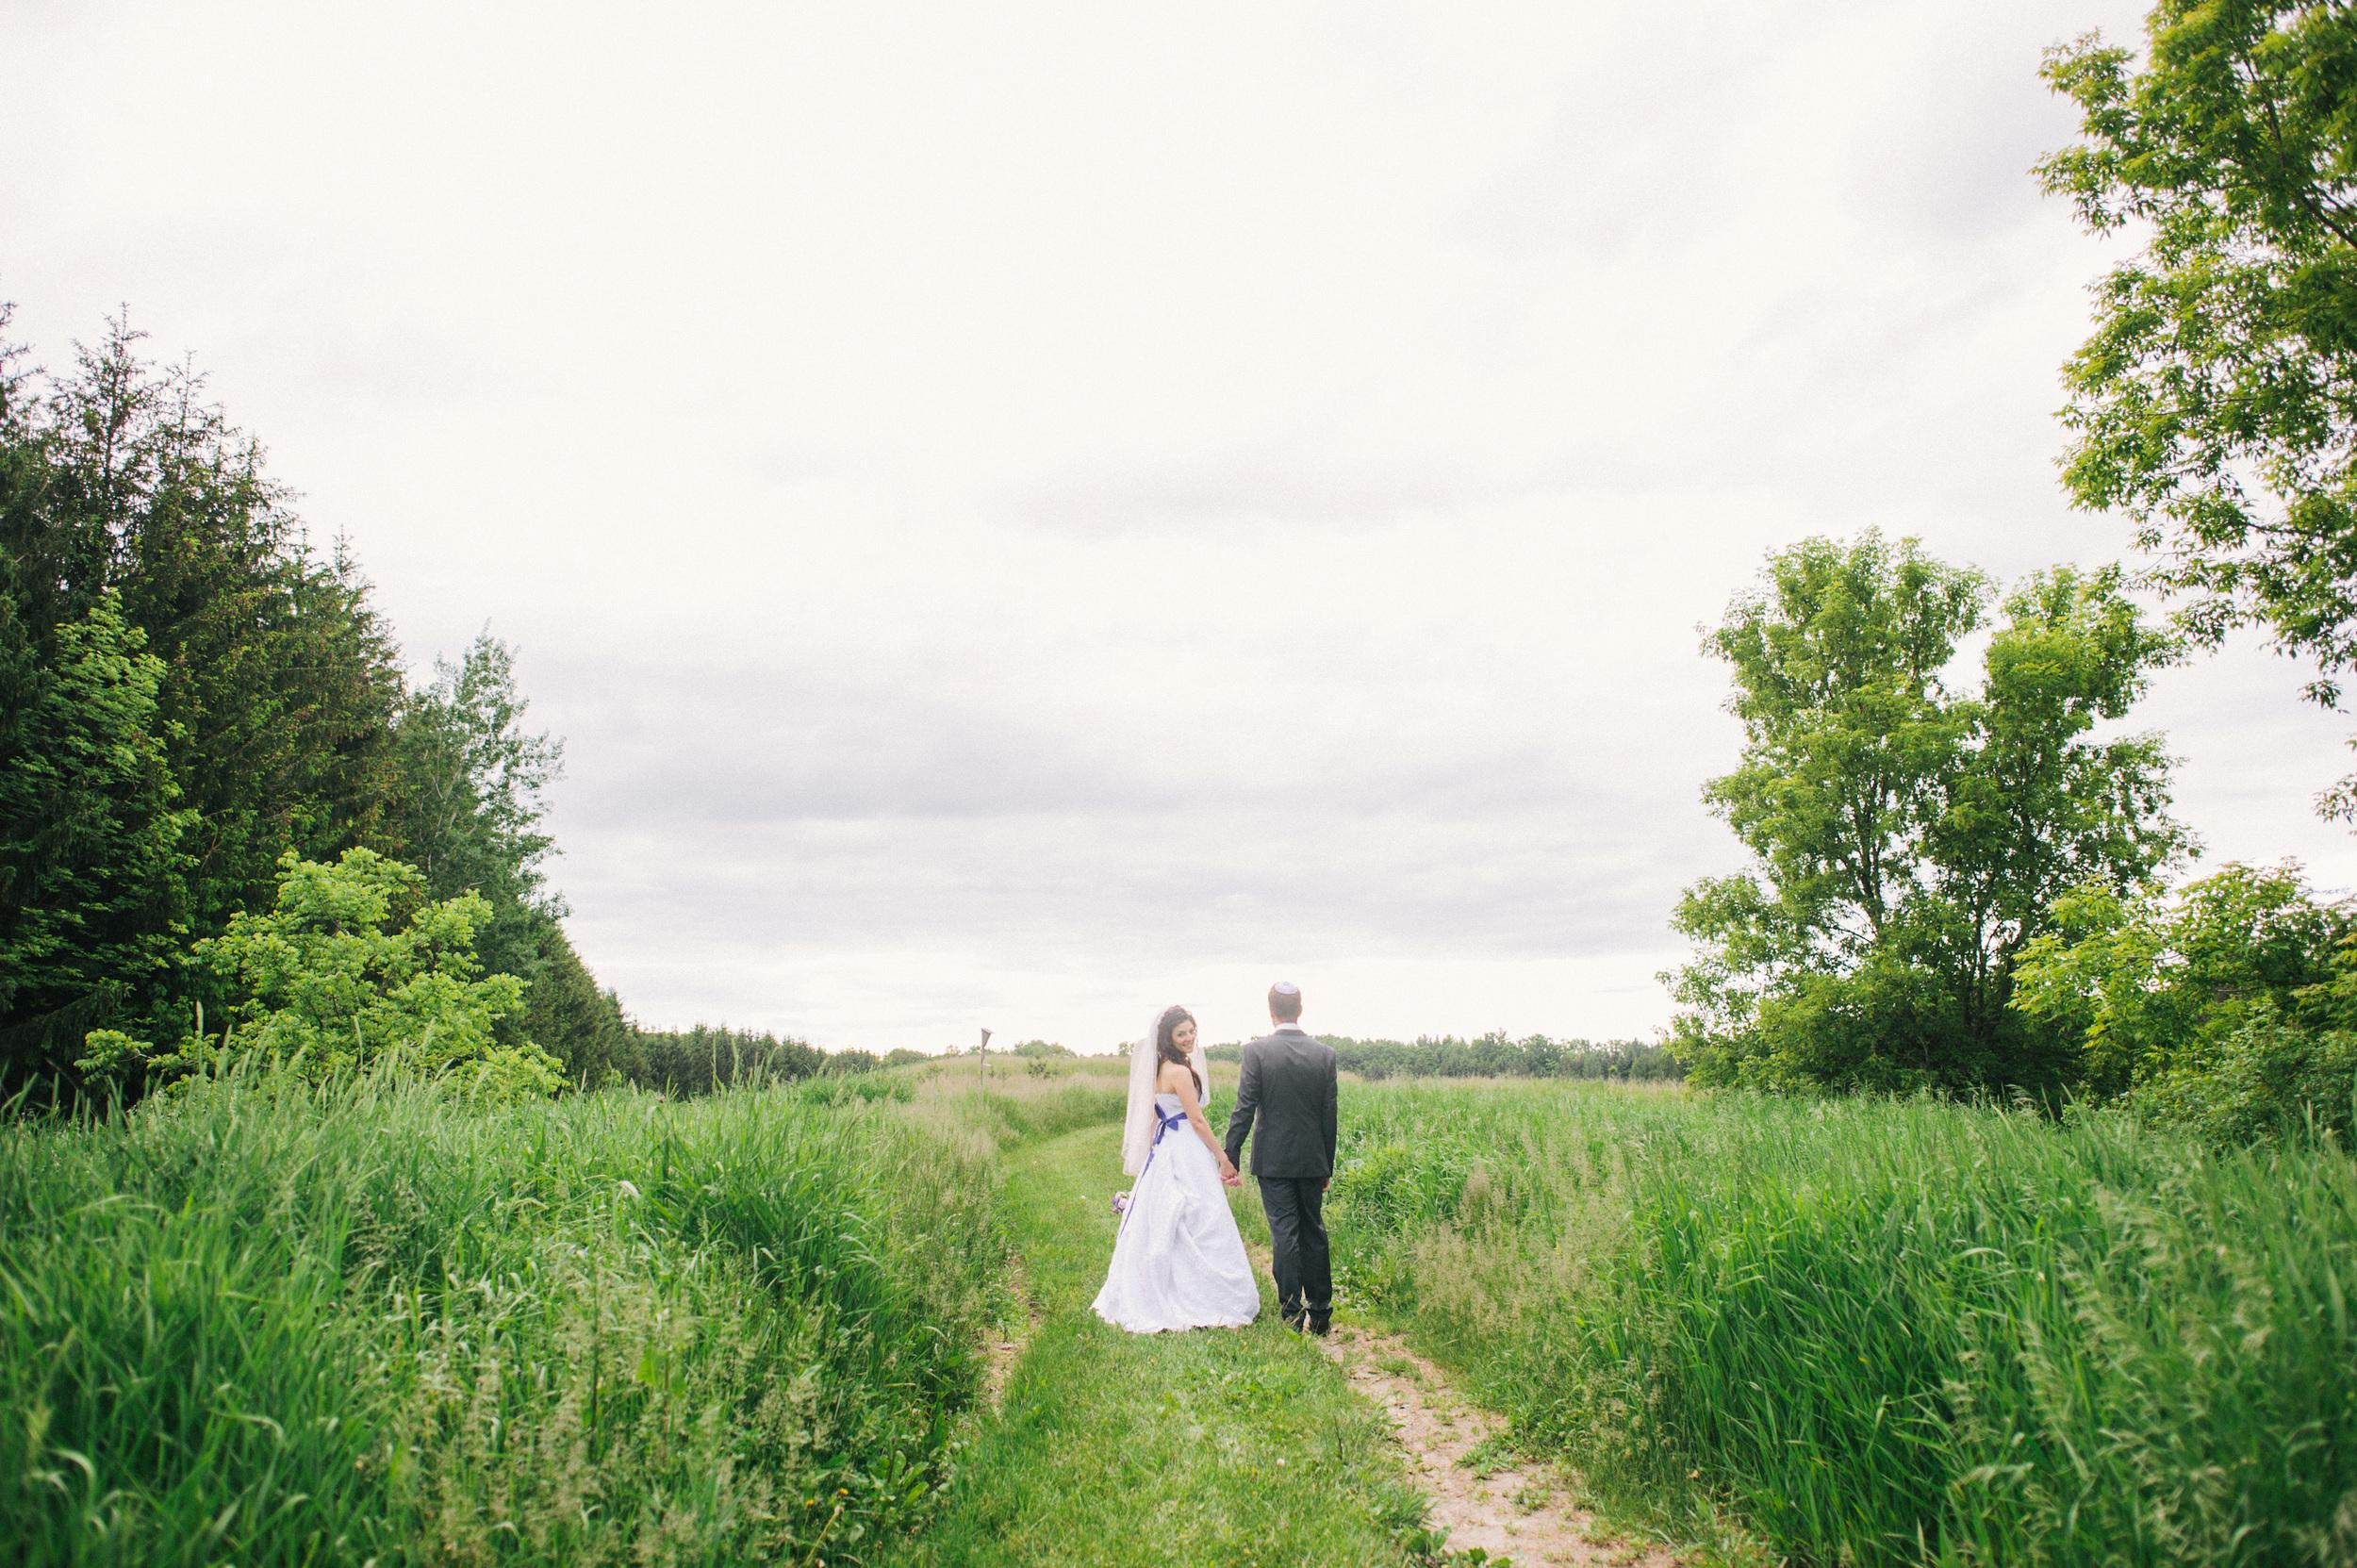 michael-rousseau-photography-kortwright-centre-wedding030.jpg